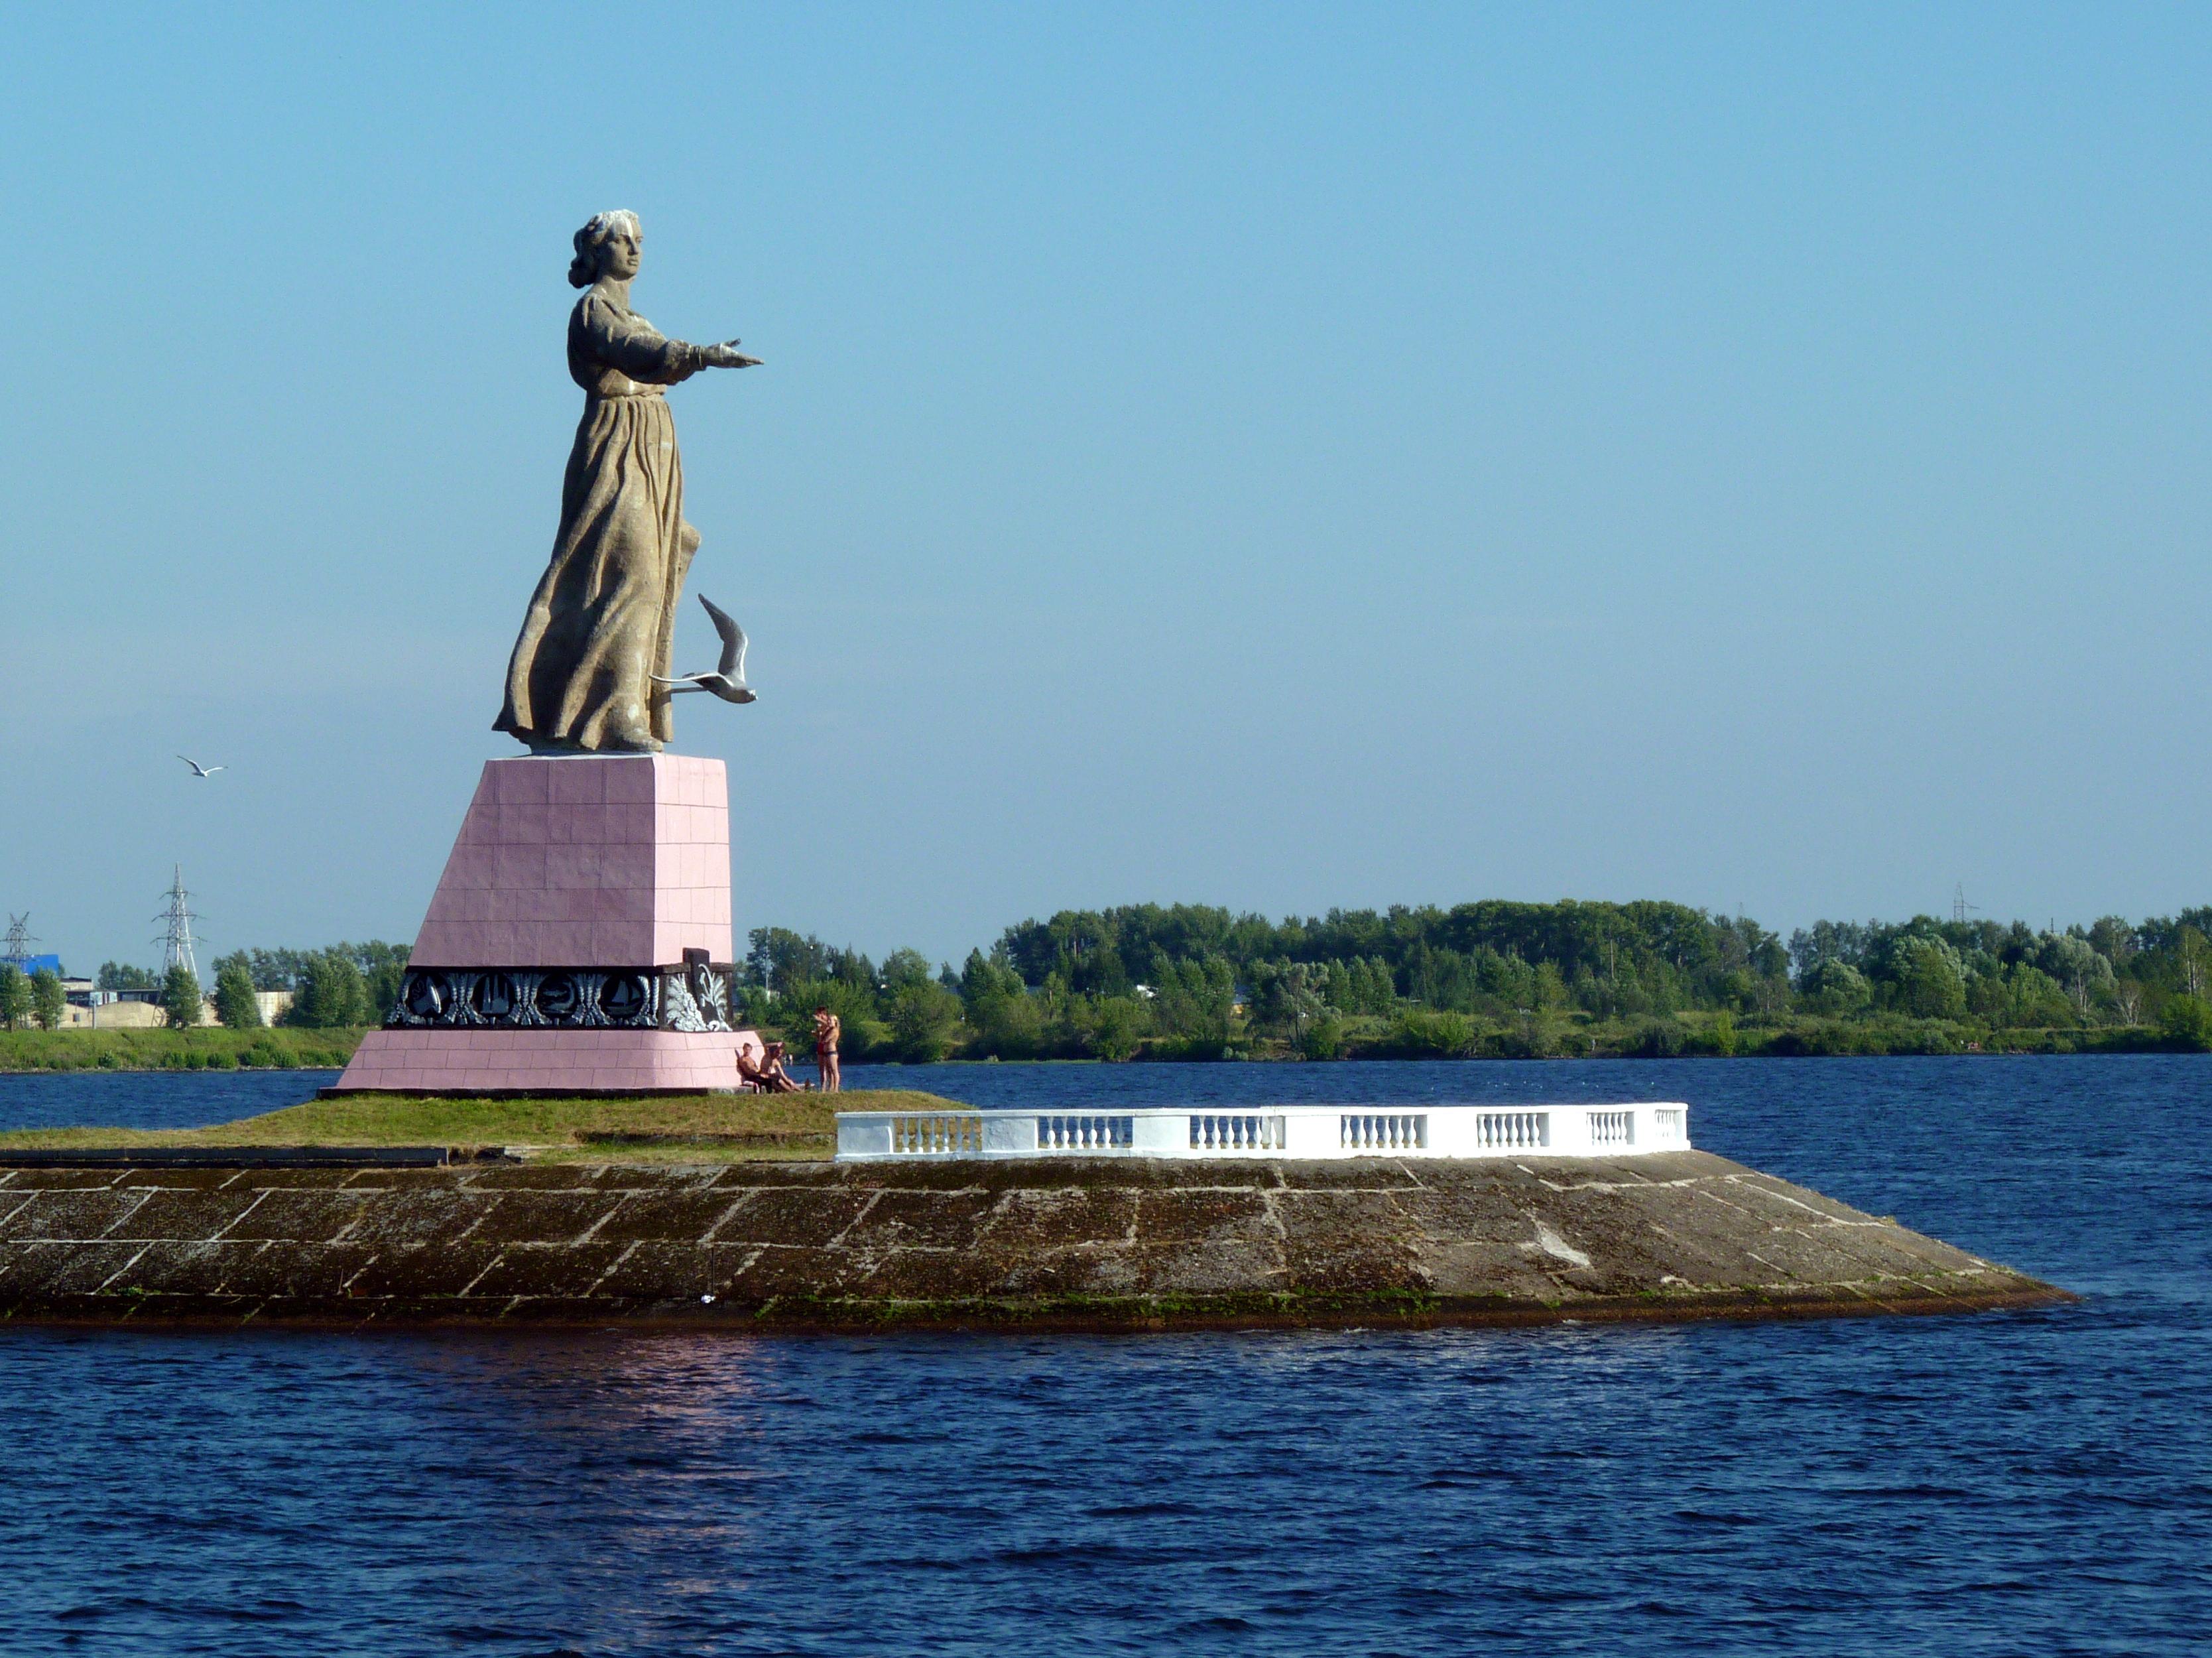 Издалека долго течет в грязи Волга